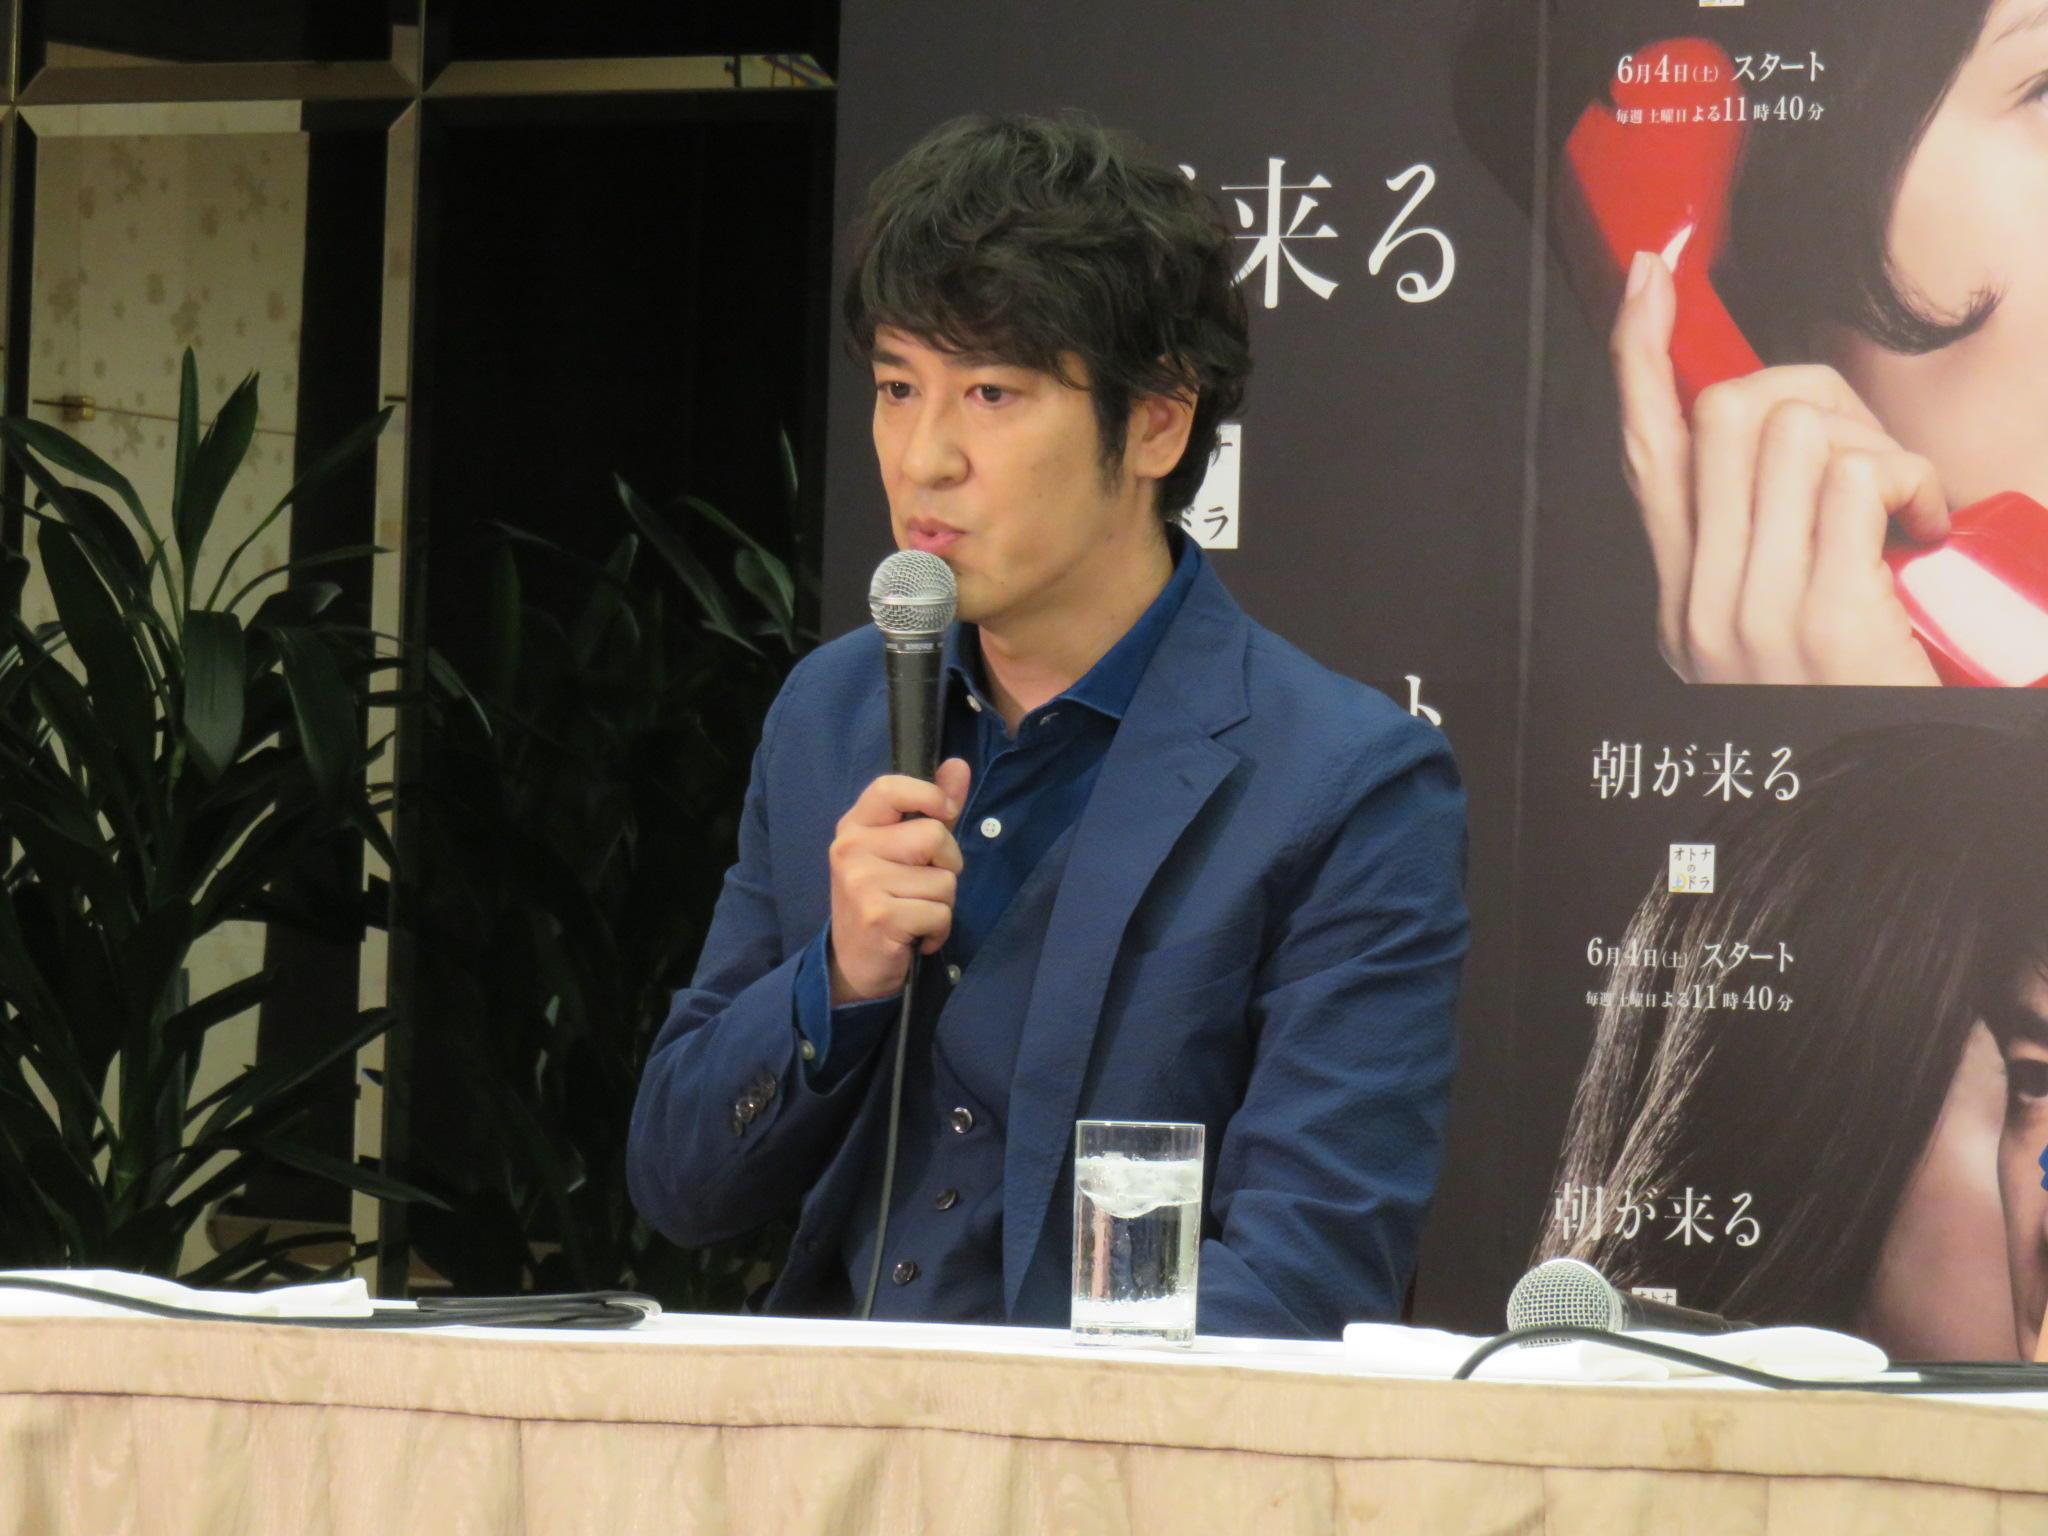 http://news.yoshimoto.co.jp/20160531153541-088b0341de8d519865d48f15f14aaa3f5bc349e0.jpg